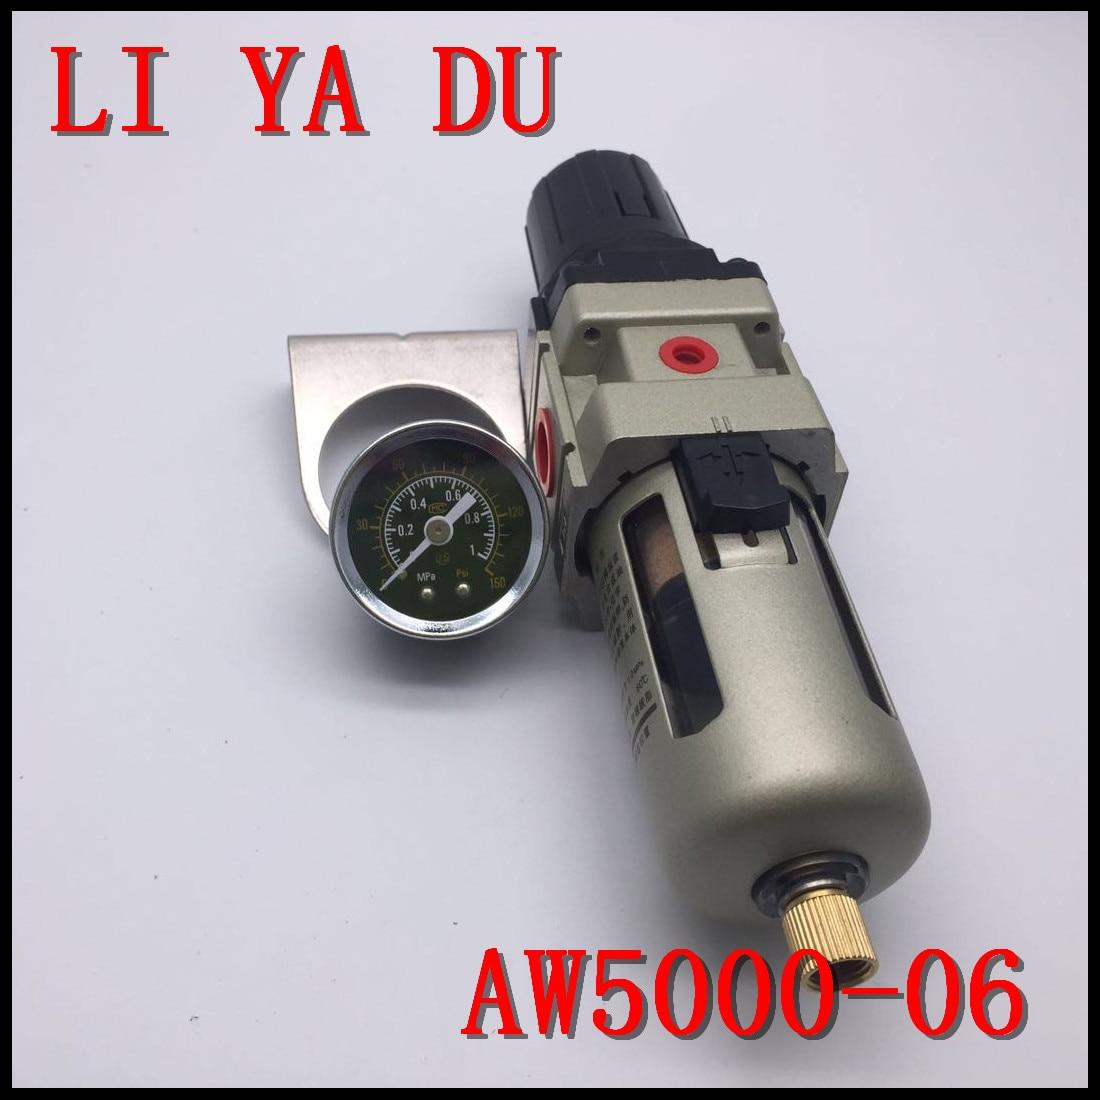 AW5000-06 G3/4 Pneumatic air compressor filter pressure reducing valve regulating valve right pneumatic high quality ac4010 06series air filter combination1000 5000 g3 4